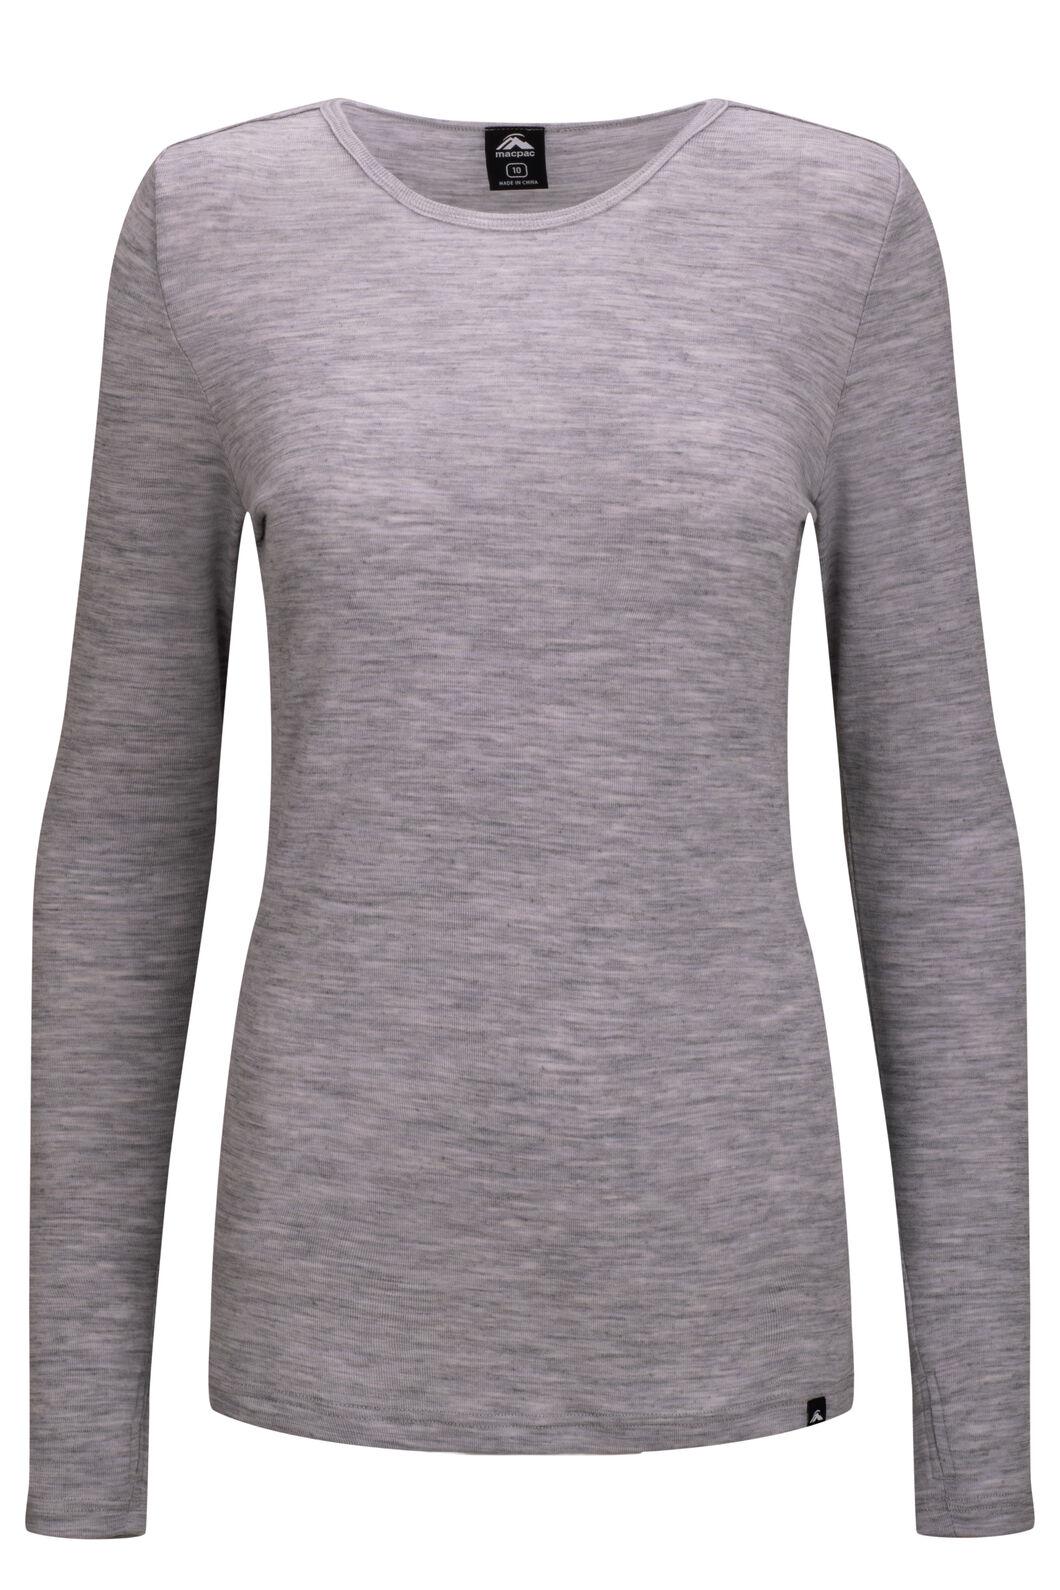 Macpac Women's 220 Merino Long Sleeve Top, Light Grey Marle, hi-res